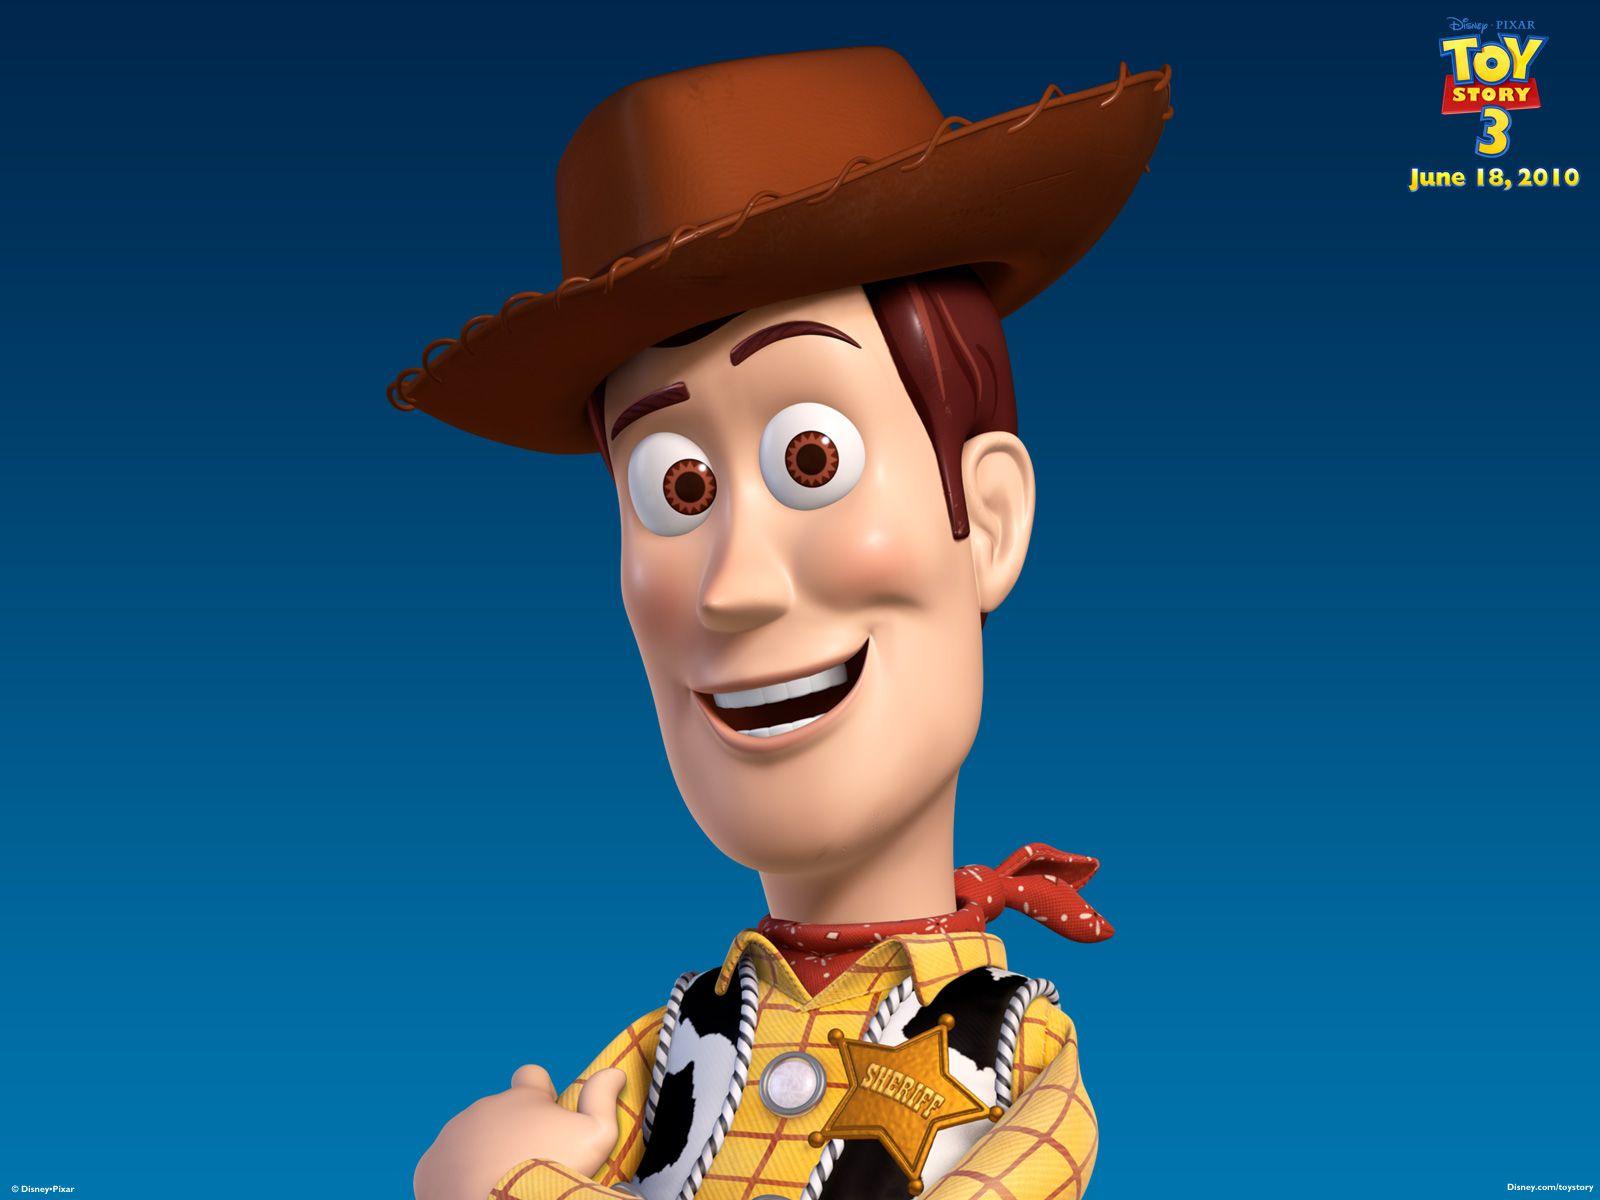 Woody Headshot Toy Story 3 Wallpaper 1600x1200